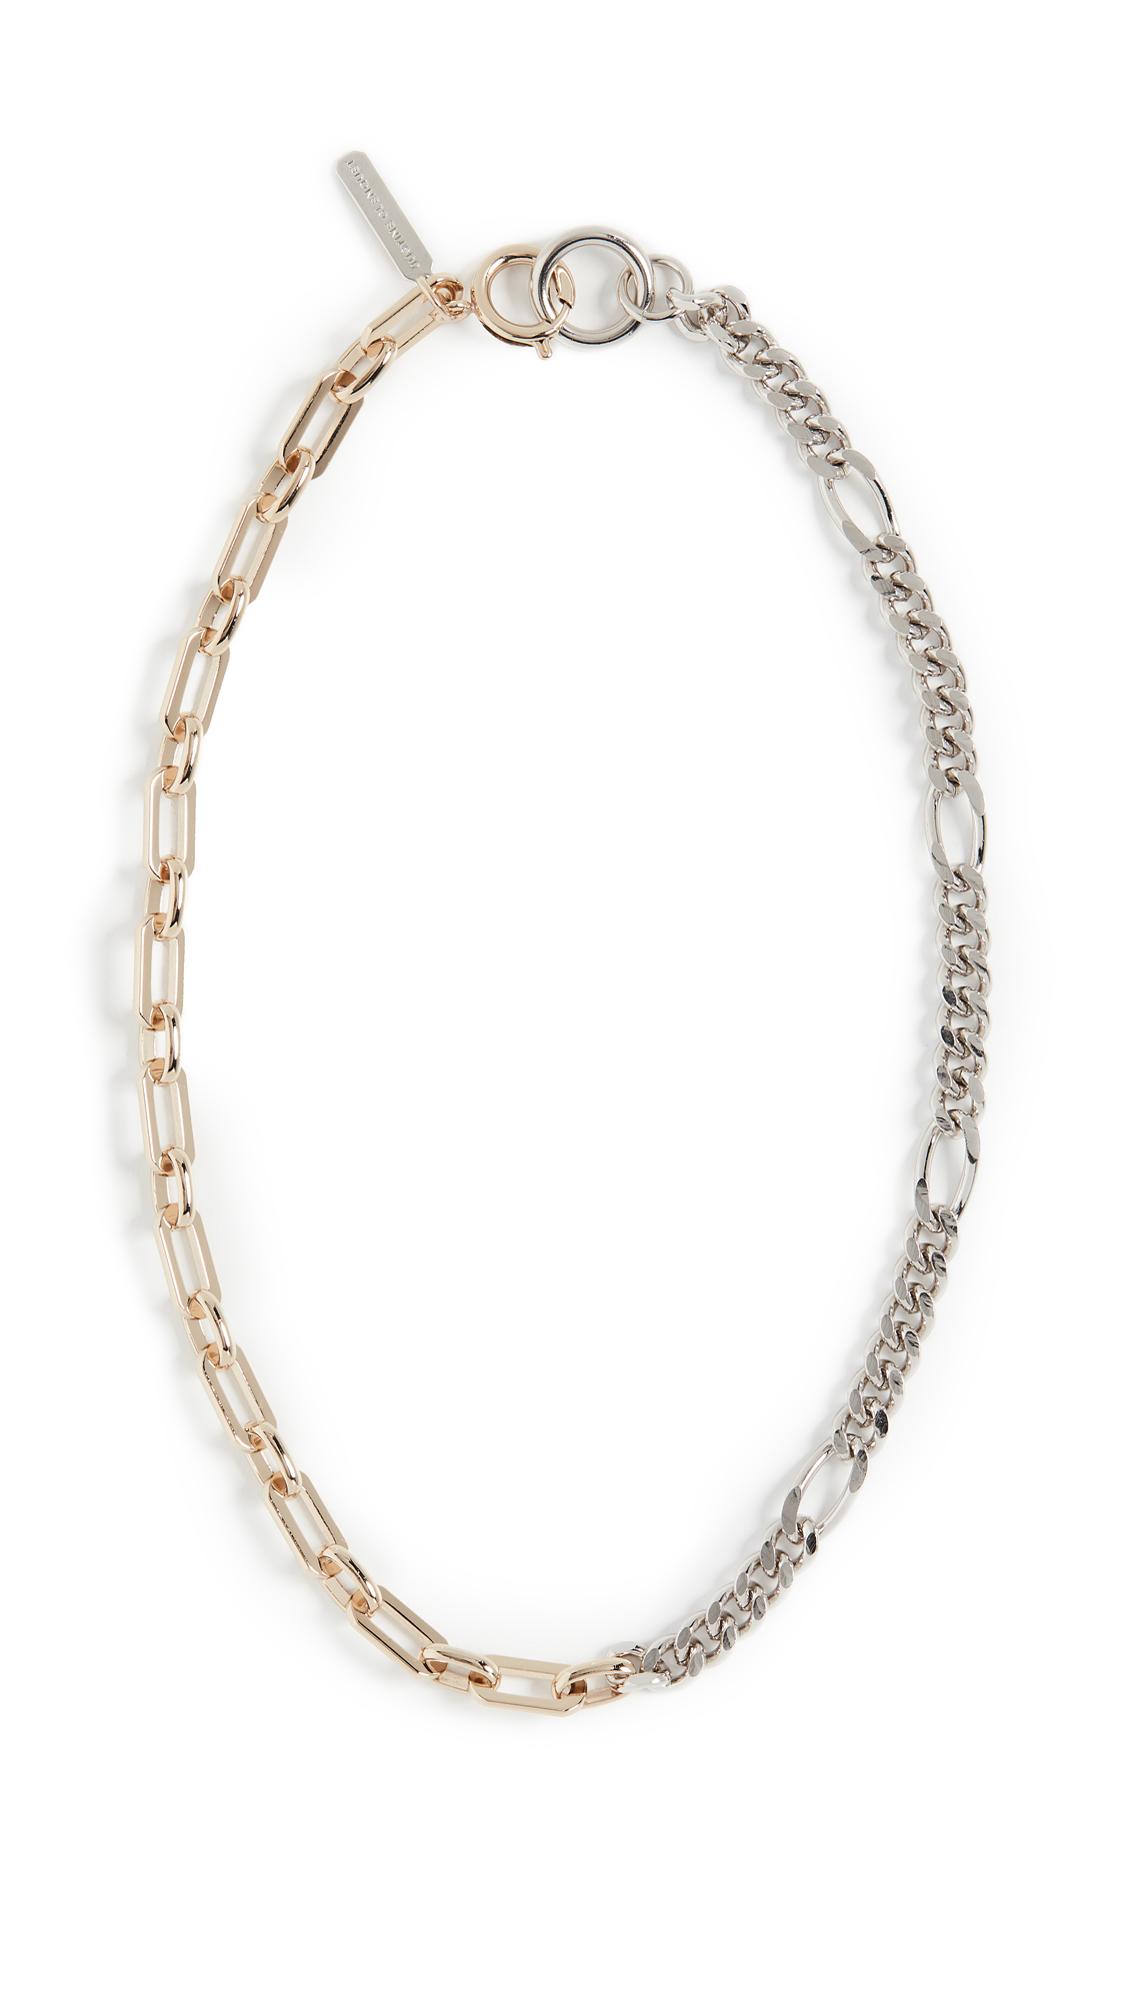 Justine Clenquet Vesper Necklace